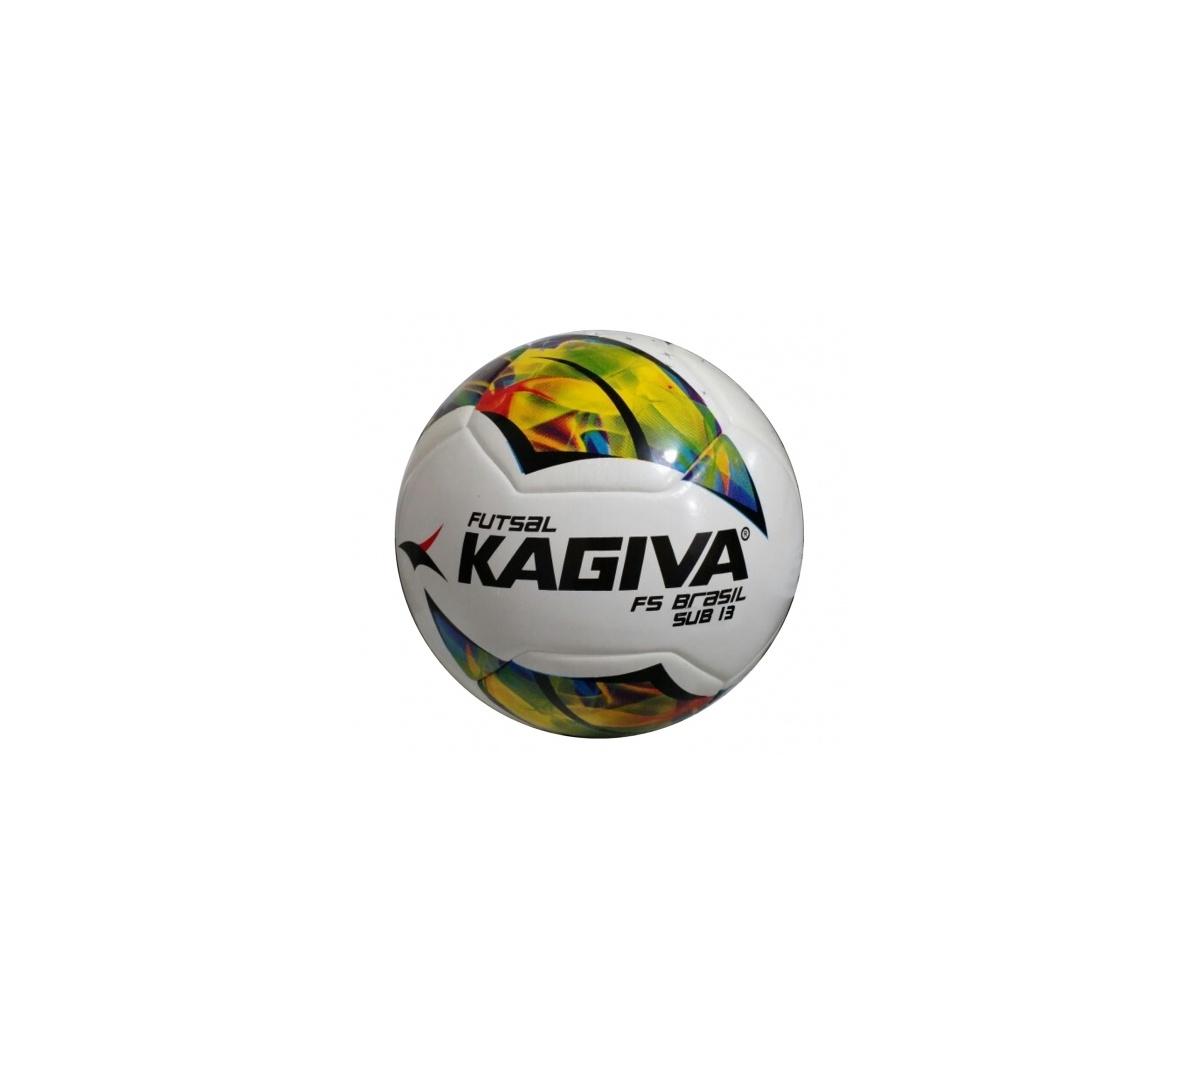 Bola Kagiva Futsal F5 Brasil Pro Sub 13 - Mundo do Futebol 0aef4628a1899